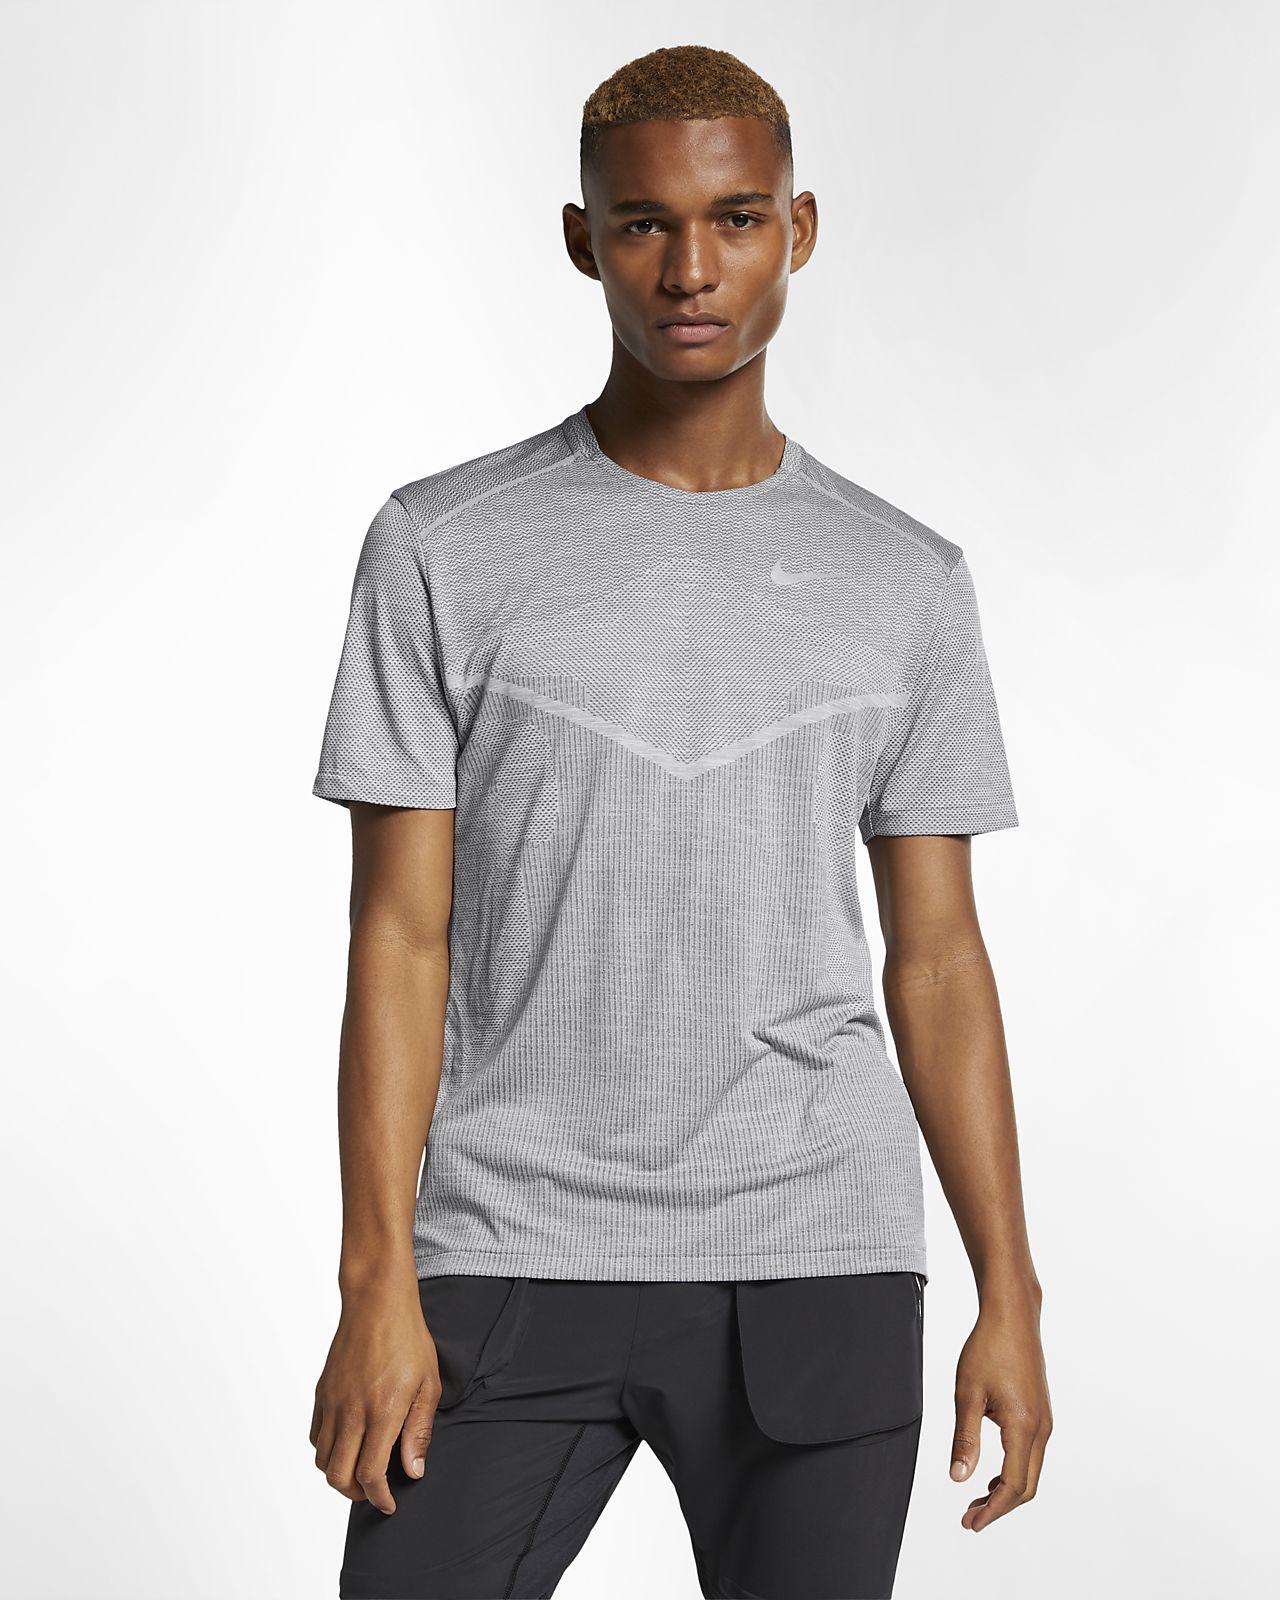 Camisola de running de manga curta Nike TechKnit Ultra para homem